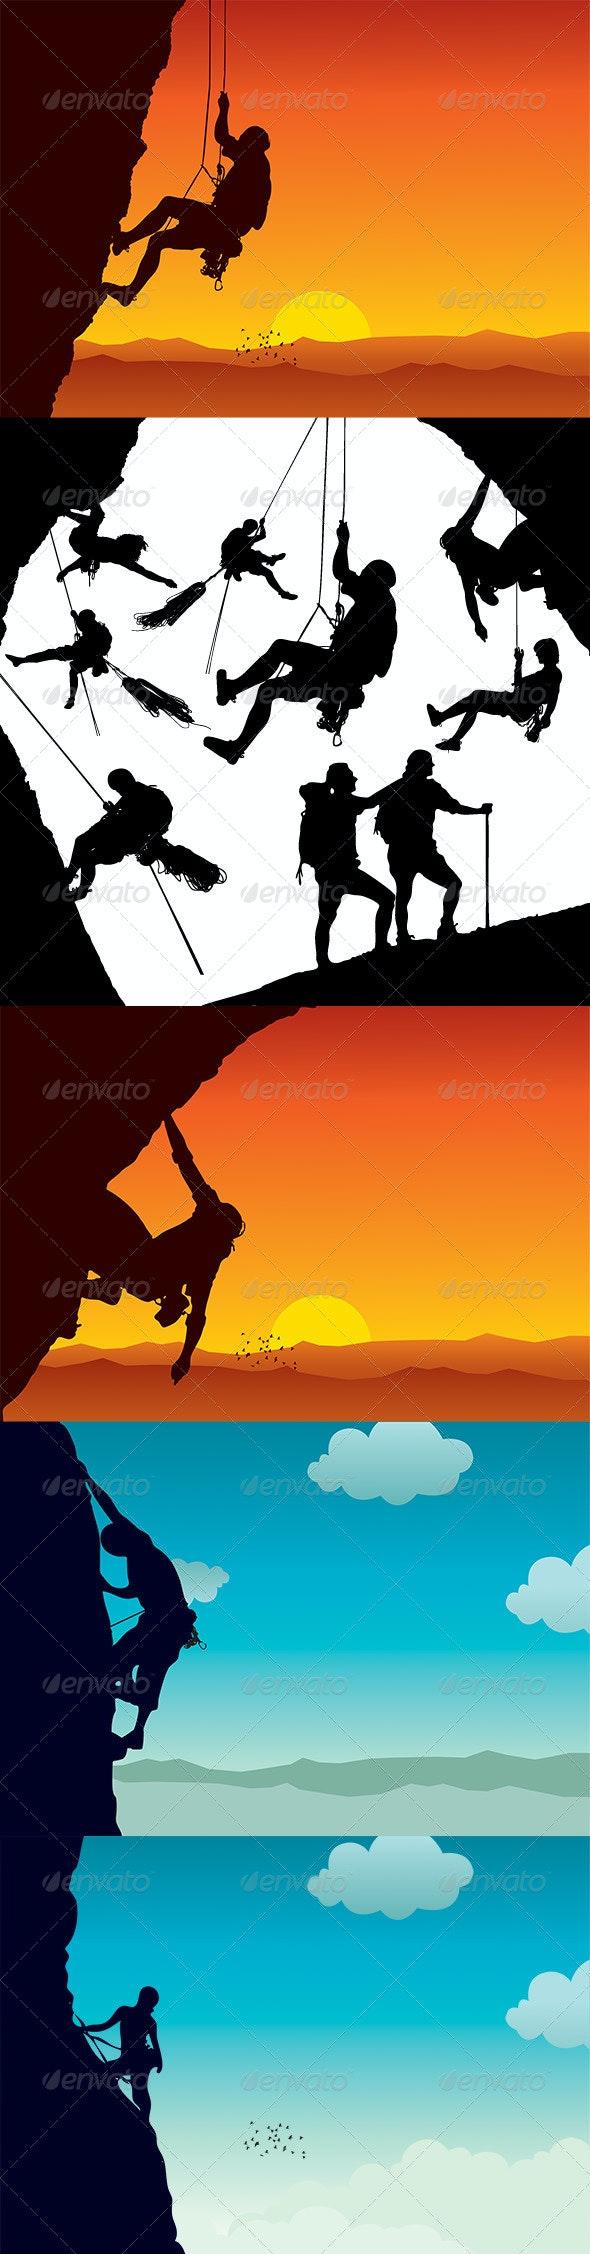 Vector Climber Silhouettes - Sports/Activity Conceptual